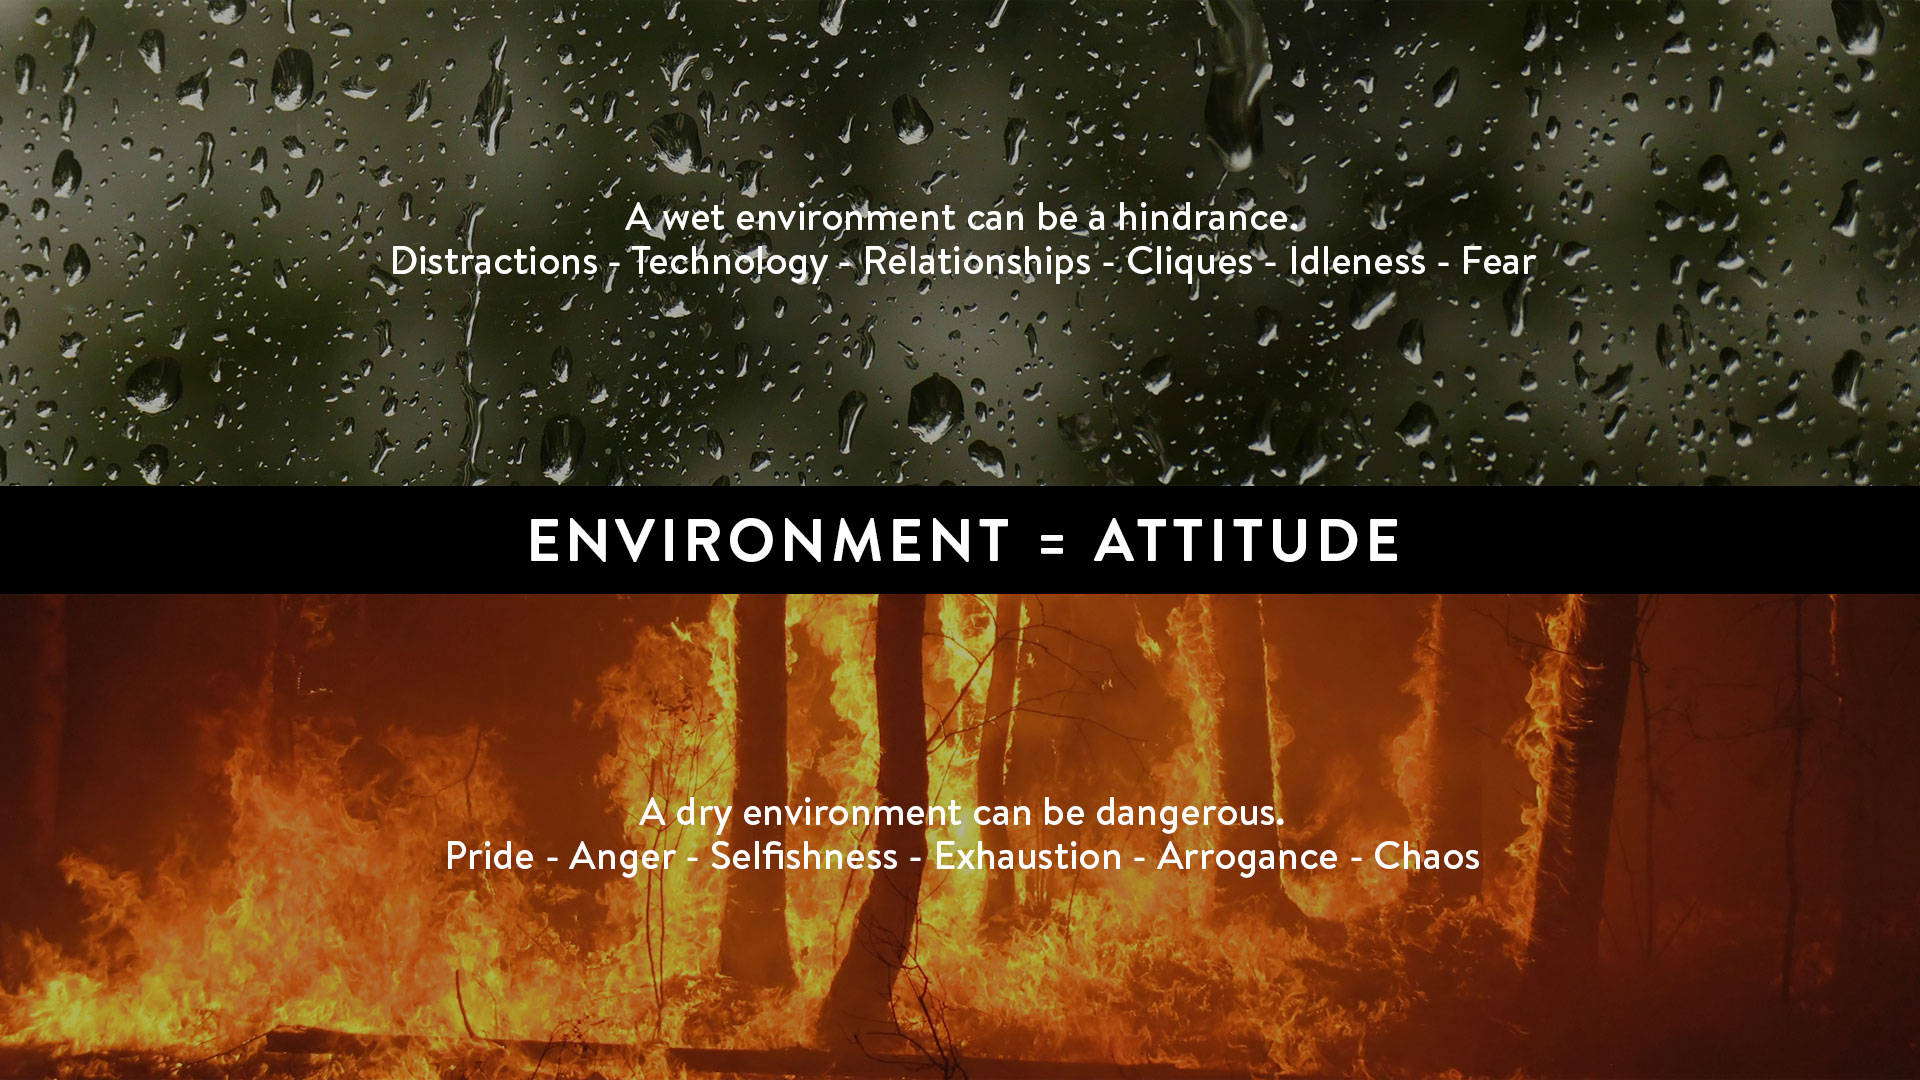 GBC-Attitude-Image